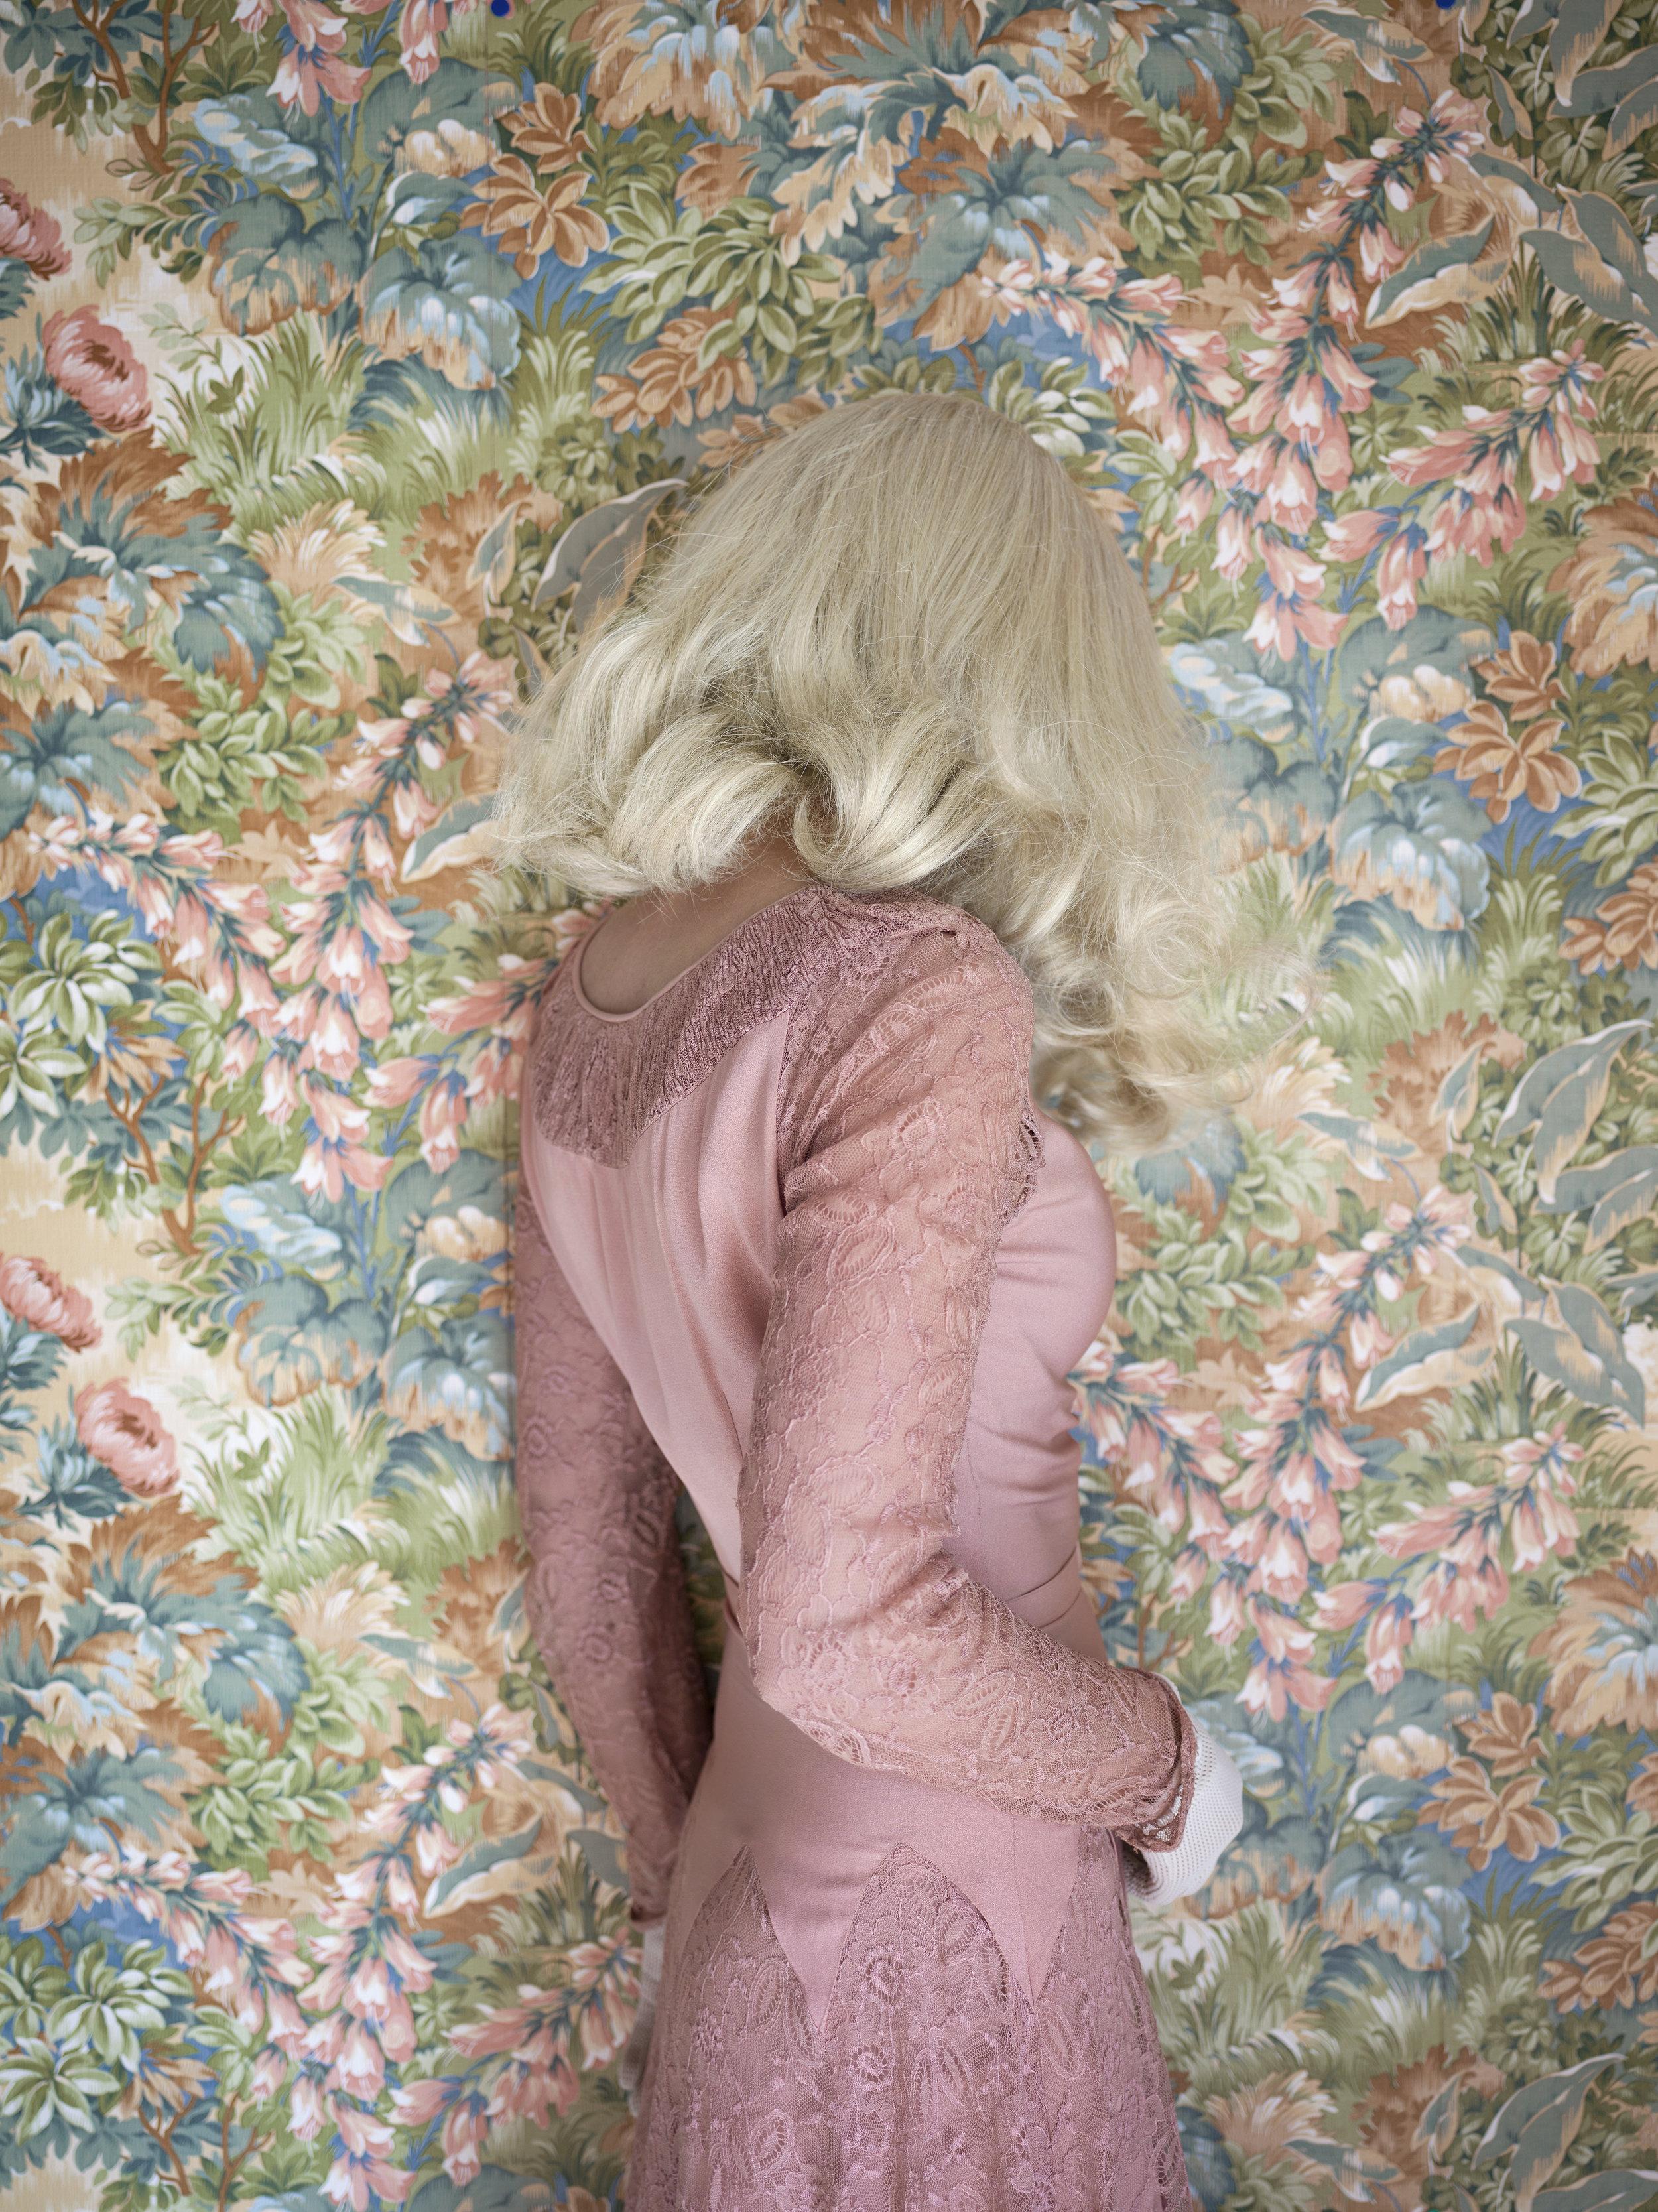 The Girl, 2016 © Anja Niemi. Courtesy of The Ravestijn Gallery.